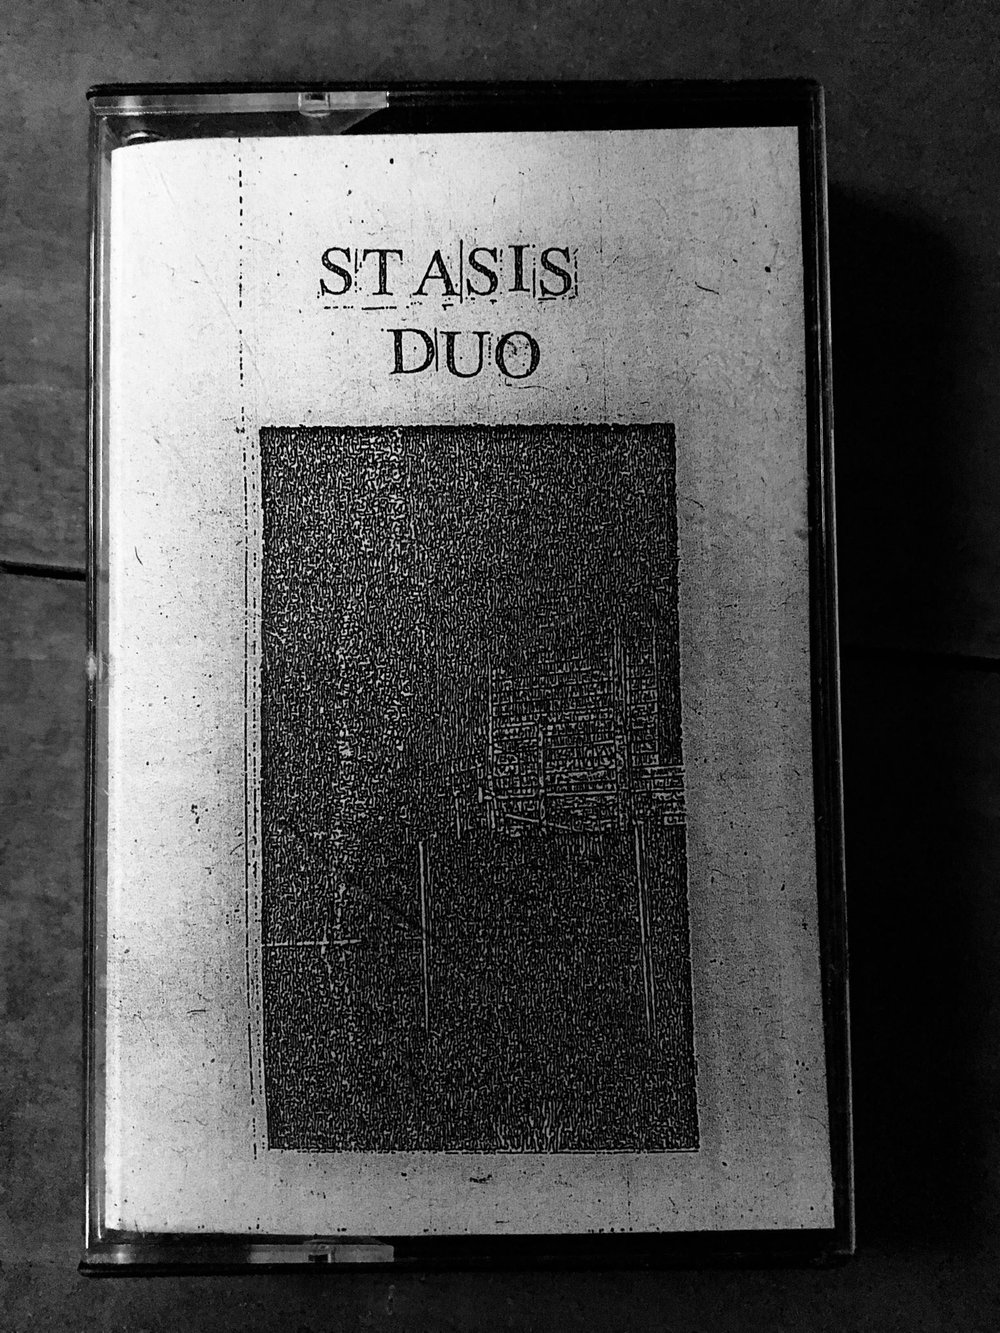 EM13 - Stasis Duo (c30)